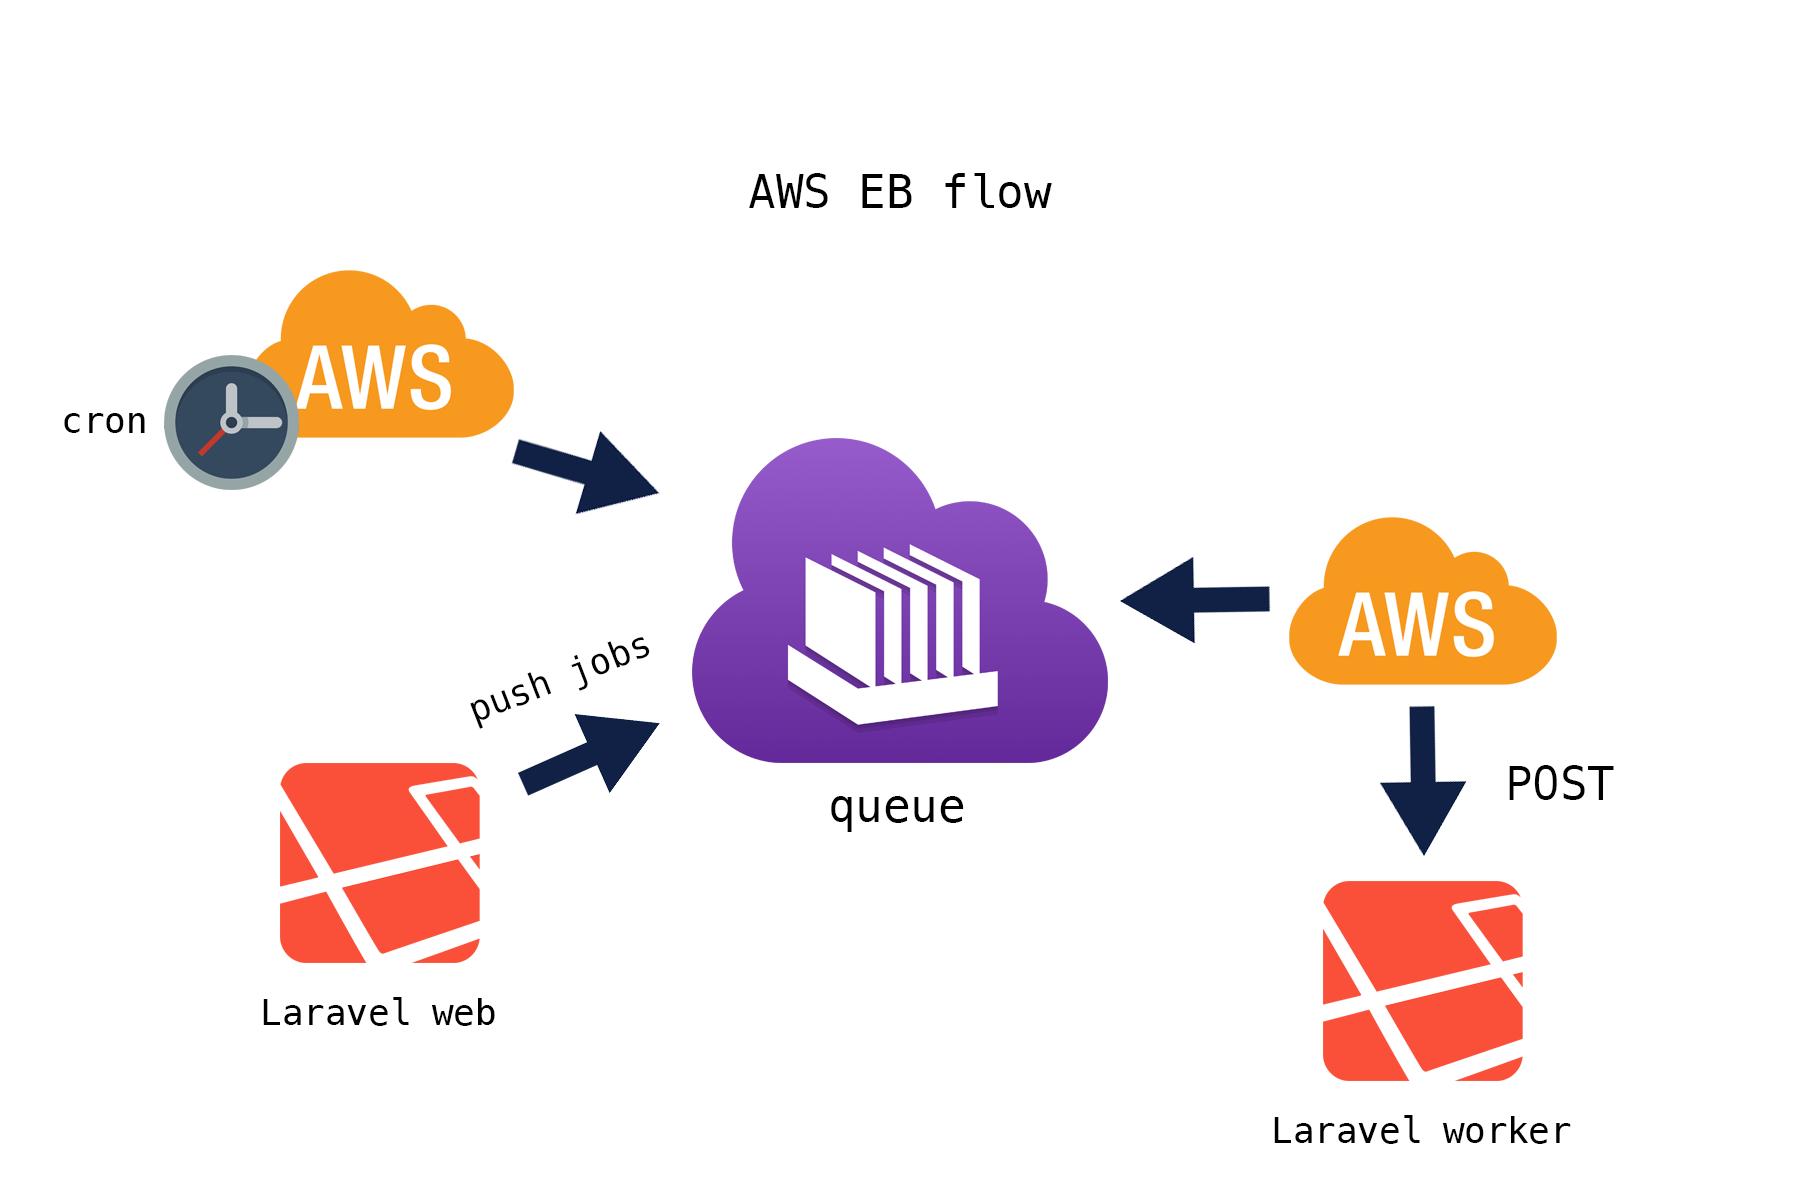 AWS Elastic Beanstalk flow